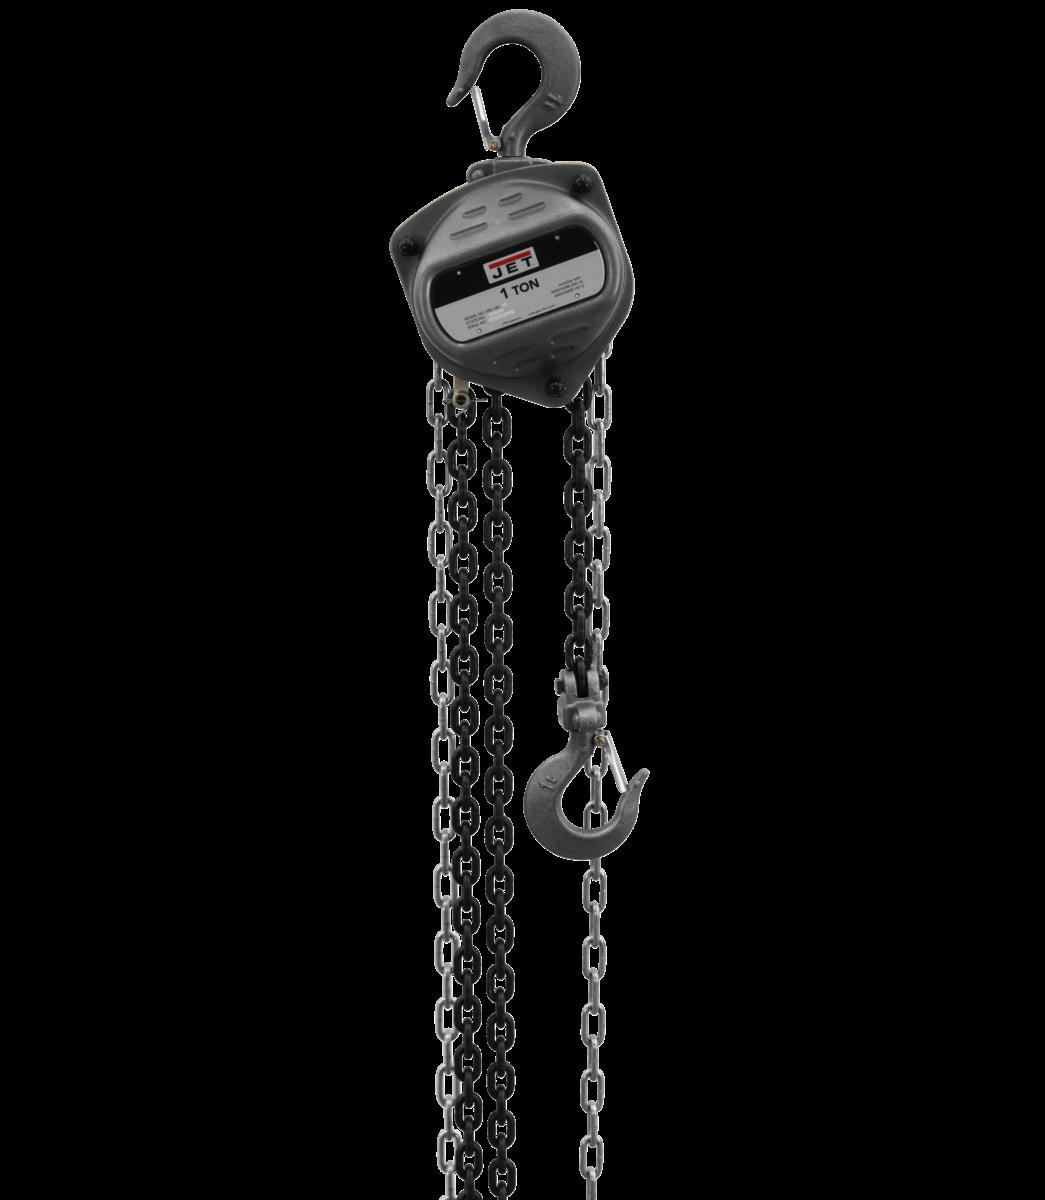 S90-100-30, 1-Ton Hand Chain Hoist With 30' Lift